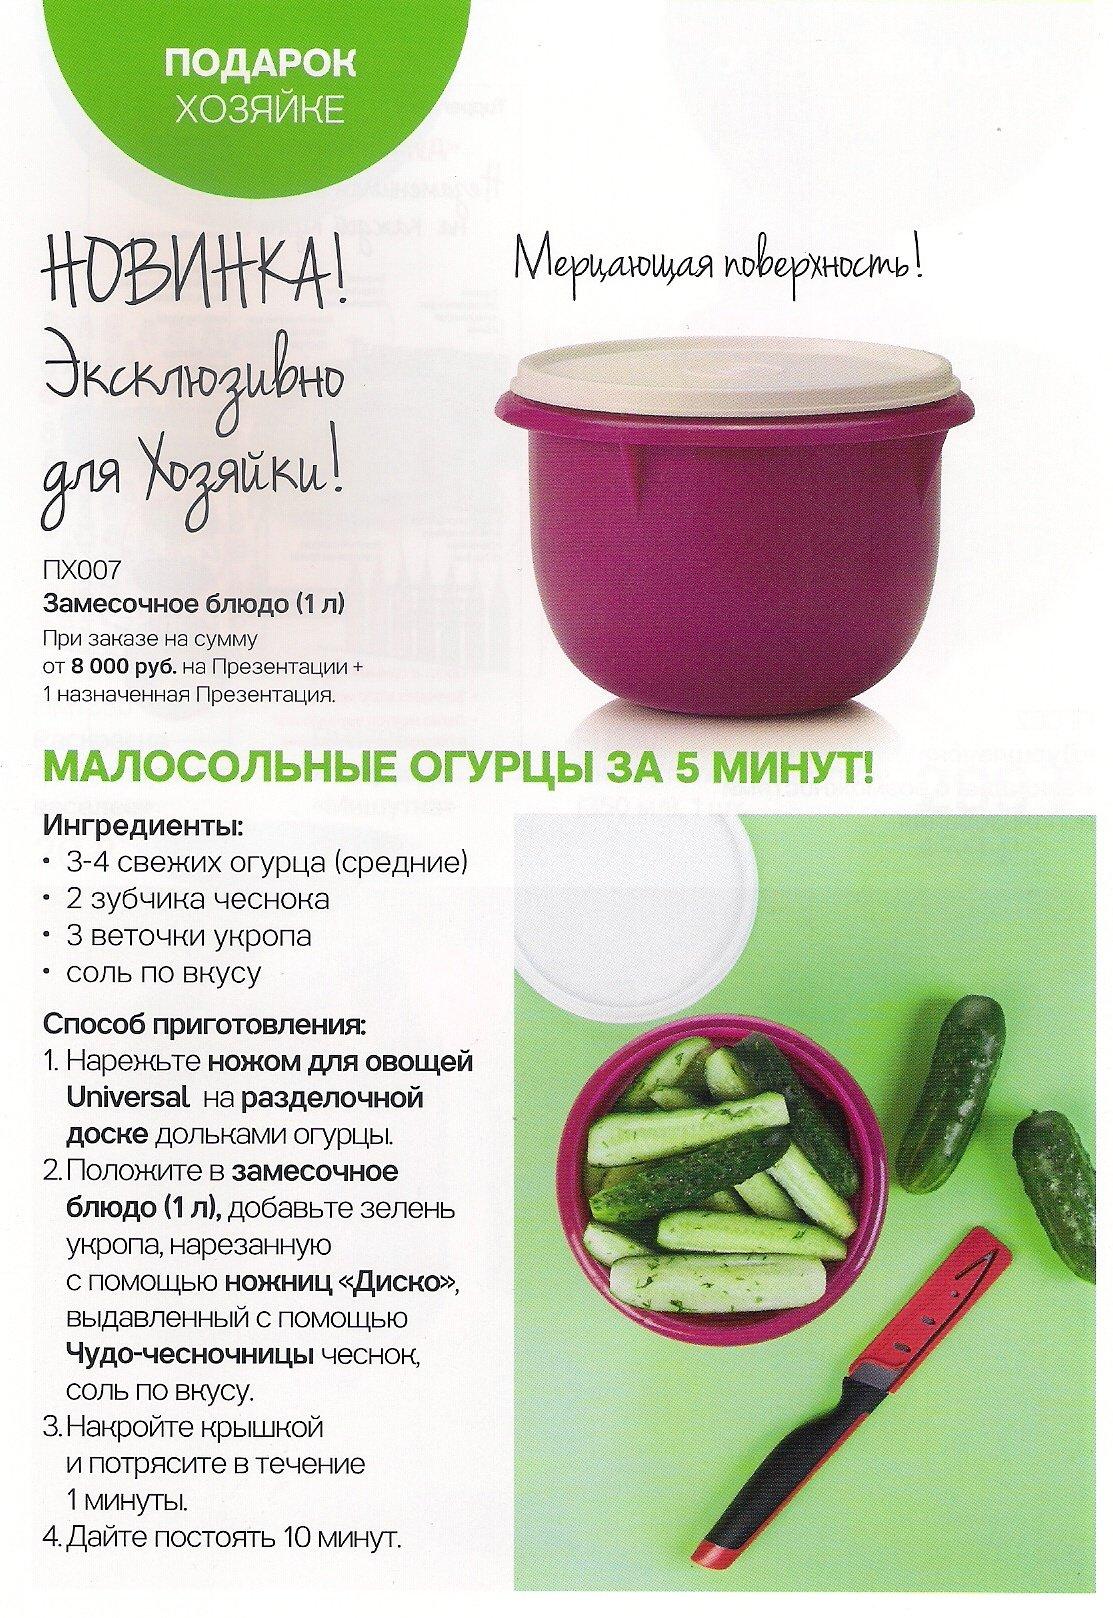 https://tupperware-online.ru/images/upload/3a.jpg